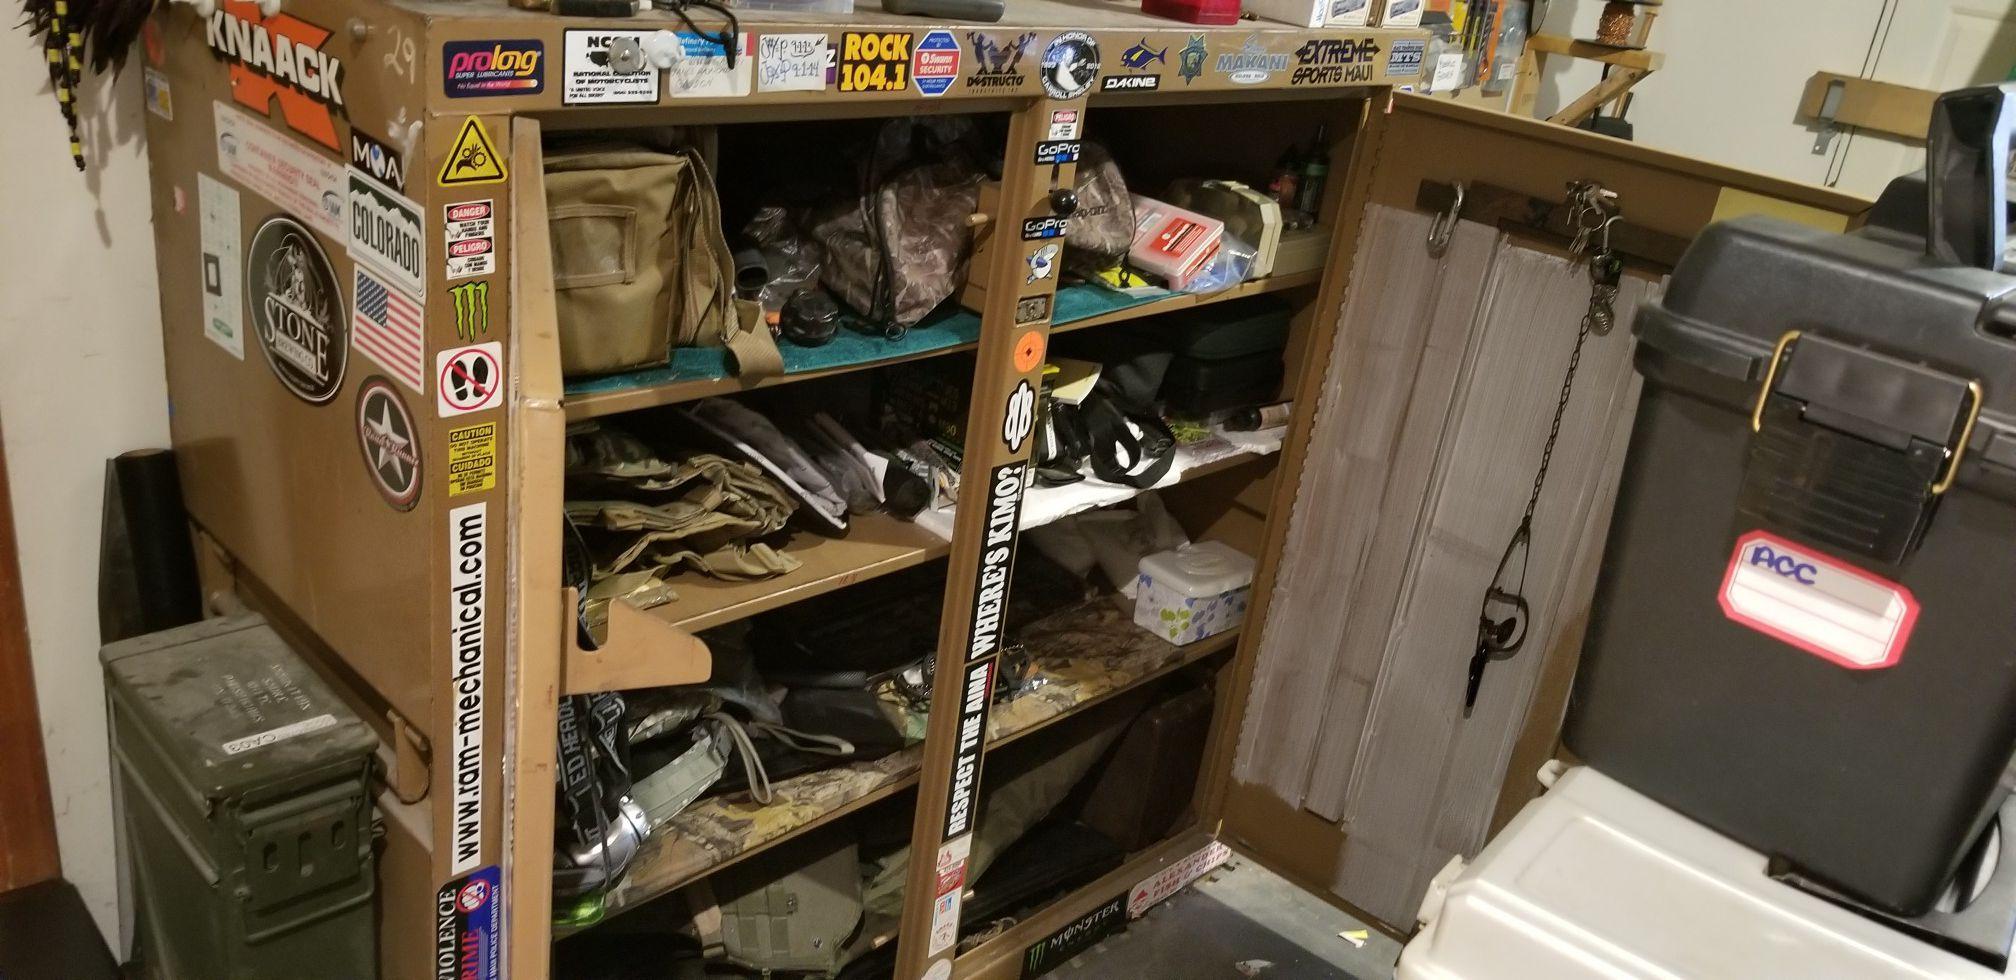 Lockable tool box 1300 obo